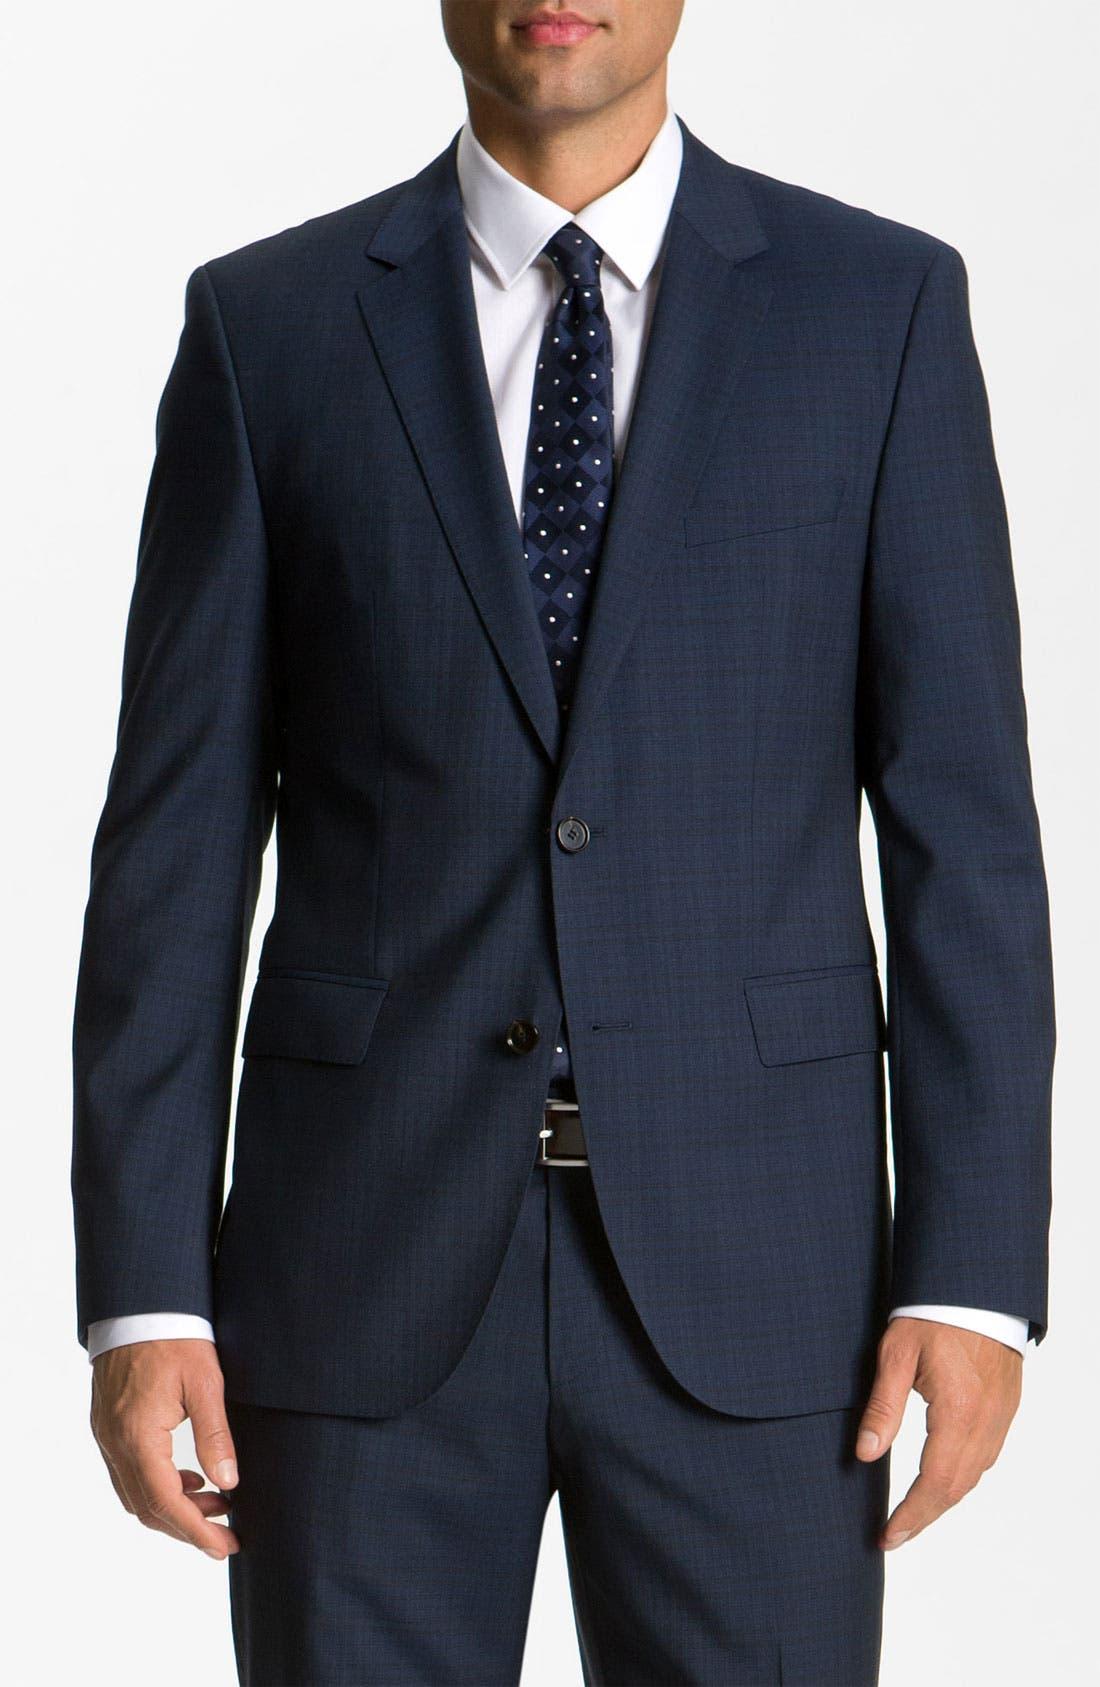 Alternate Image 1 Selected - BOSS Black 'James/Sharp' Trim Fit Wool Suit